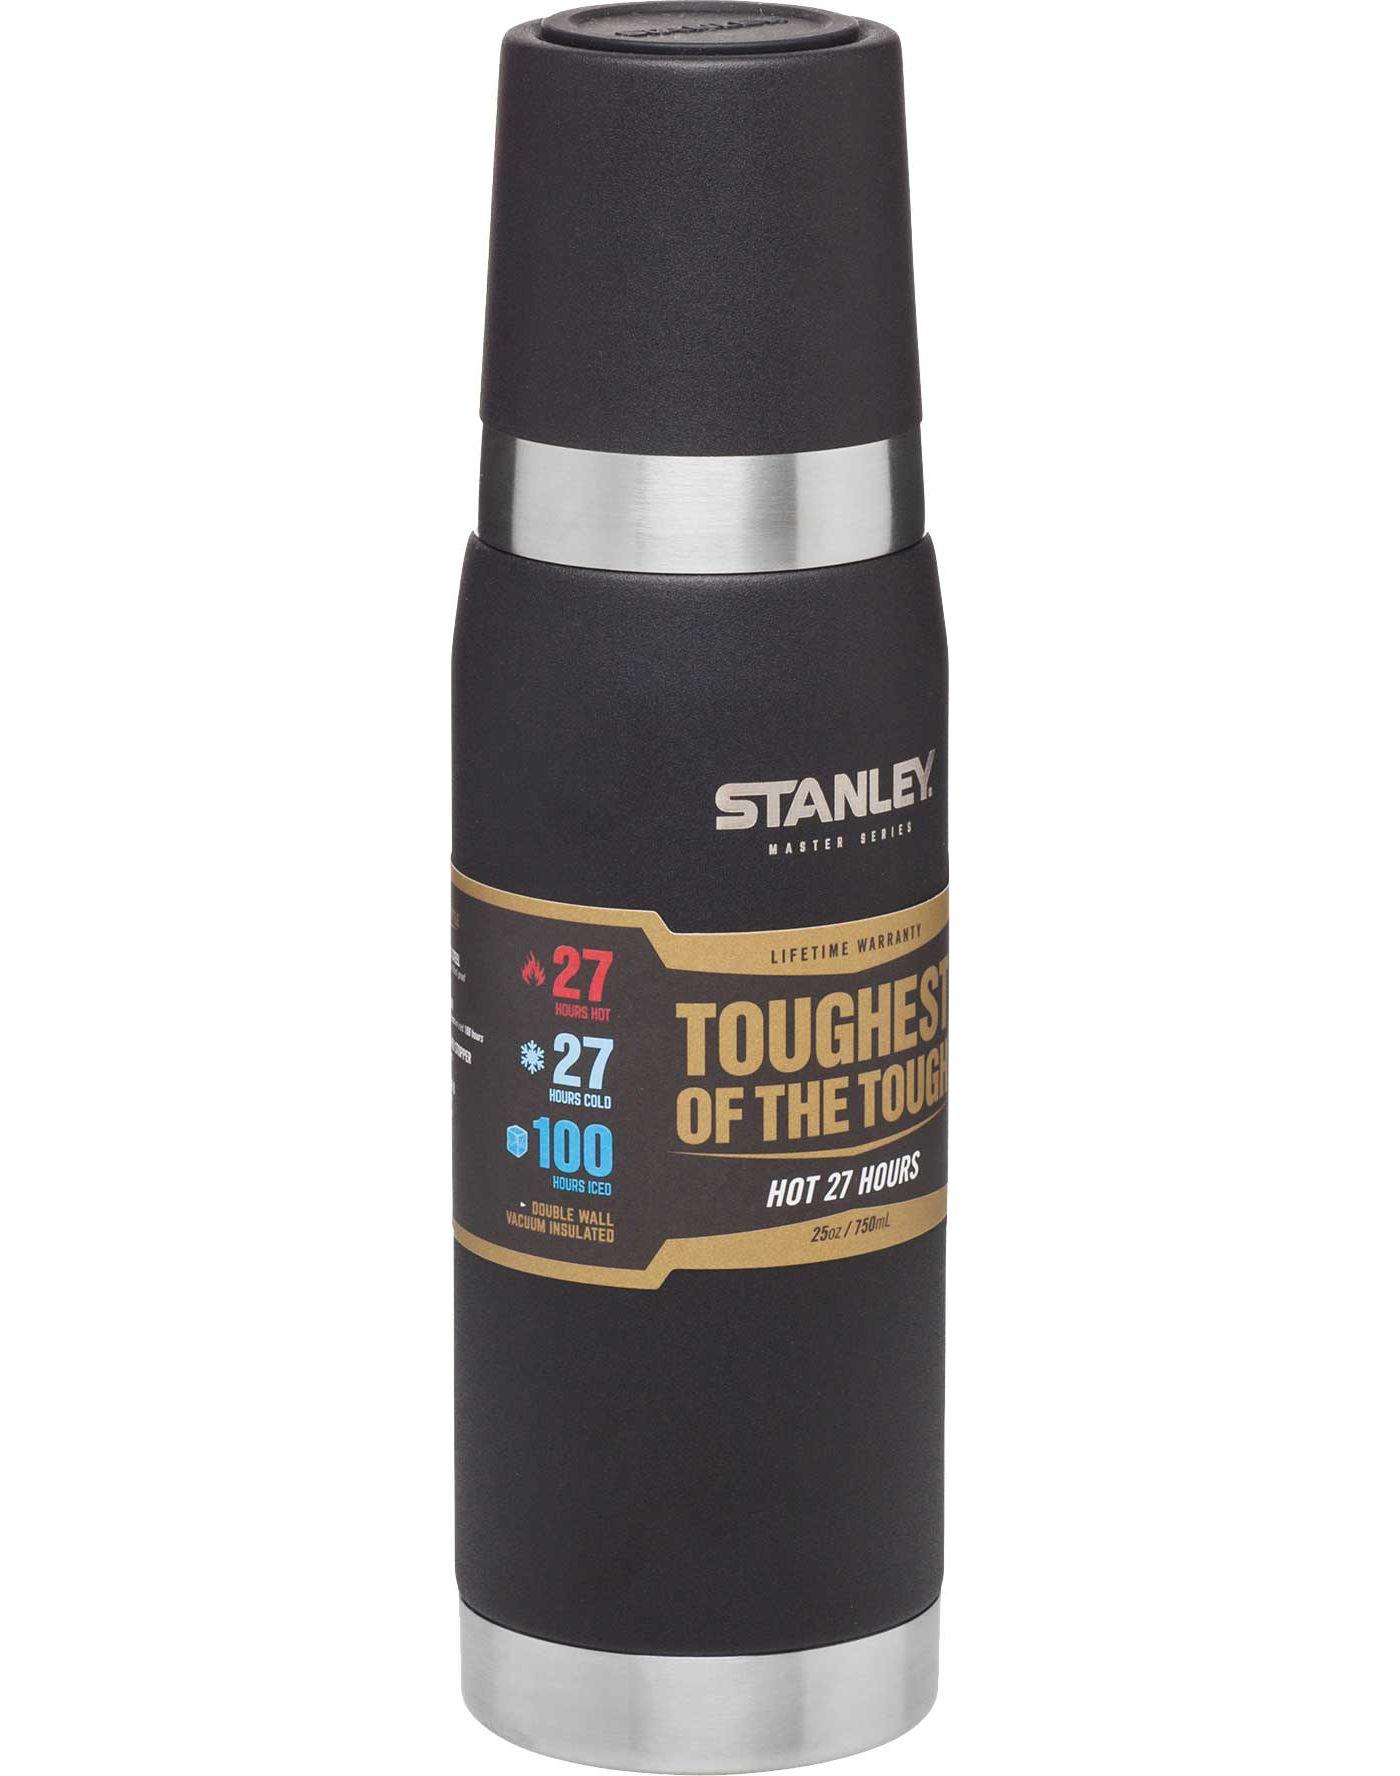 Stanley 25 oz. Master Series Vacuum Bottle